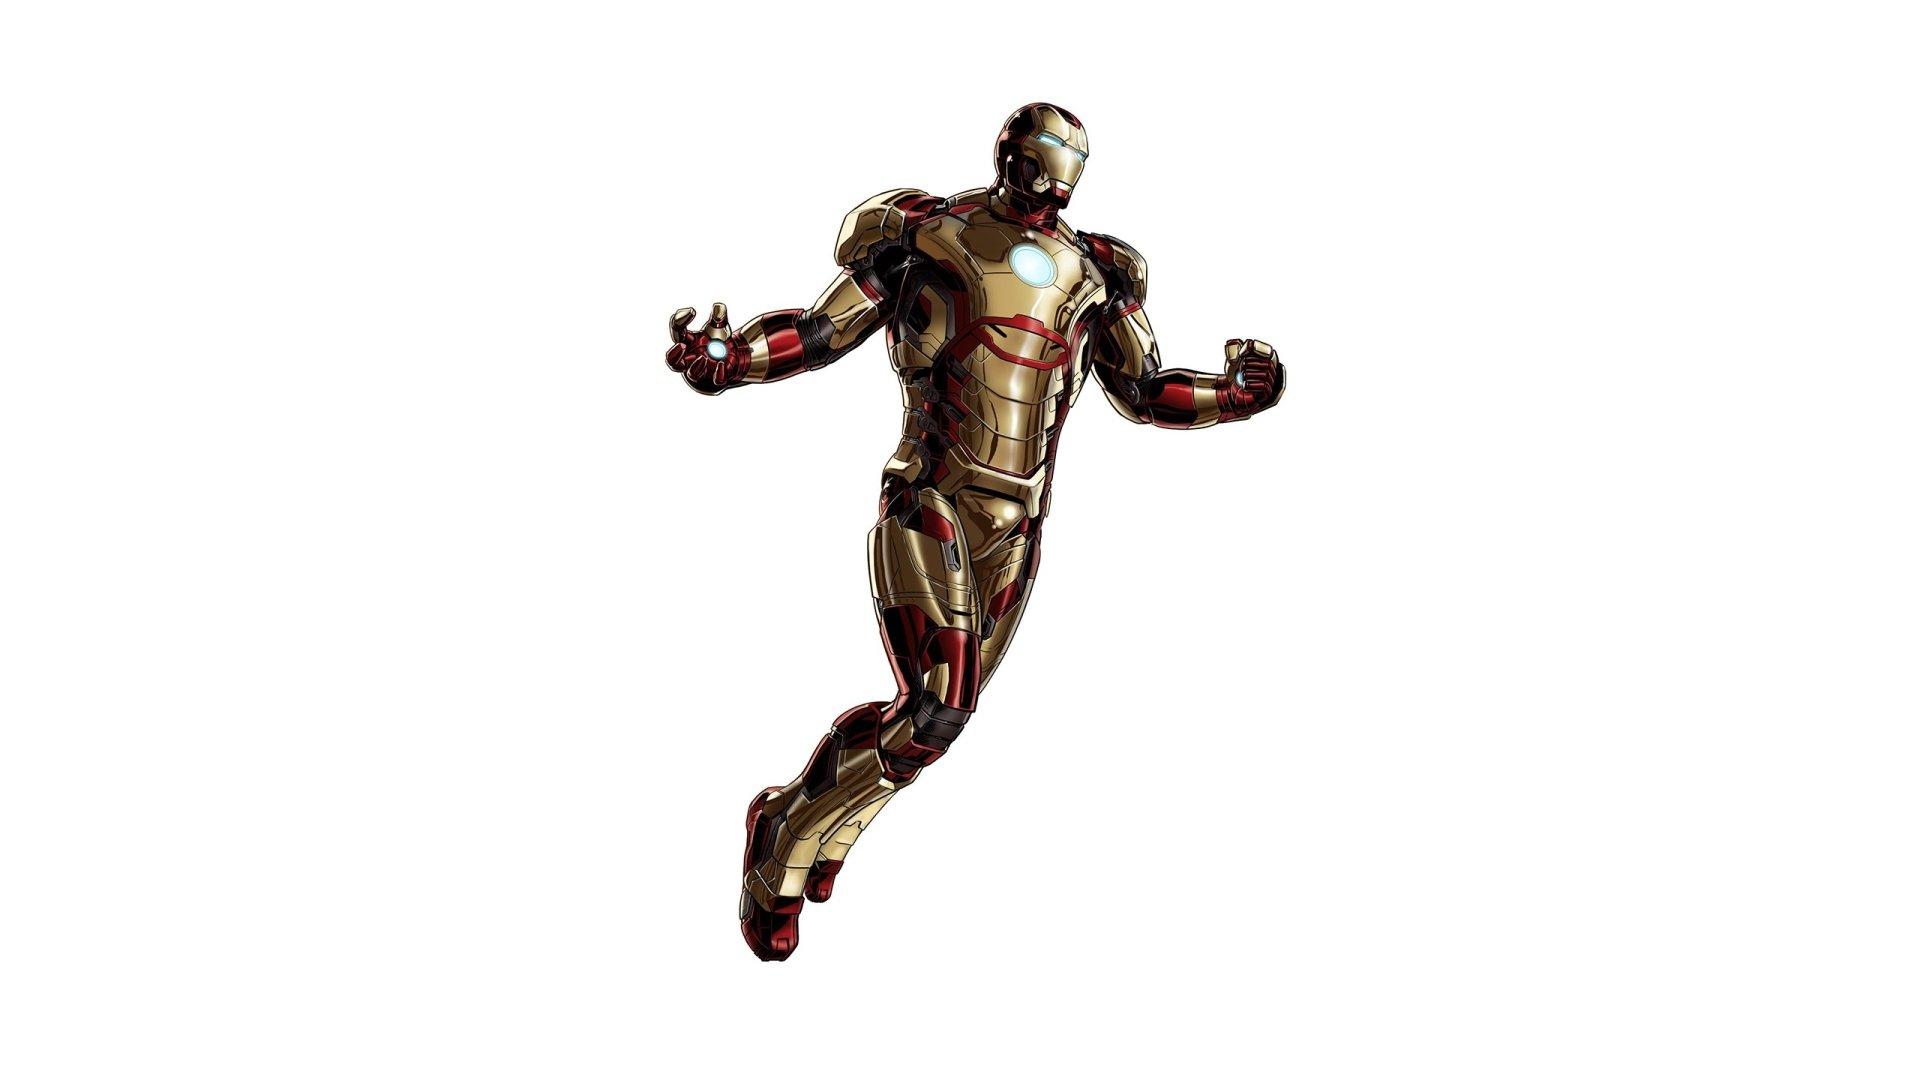 Iron man fond d 39 cran hd arri re plan 2560x1440 id 401595 wallpaper abyss - Iron man telecharger ...